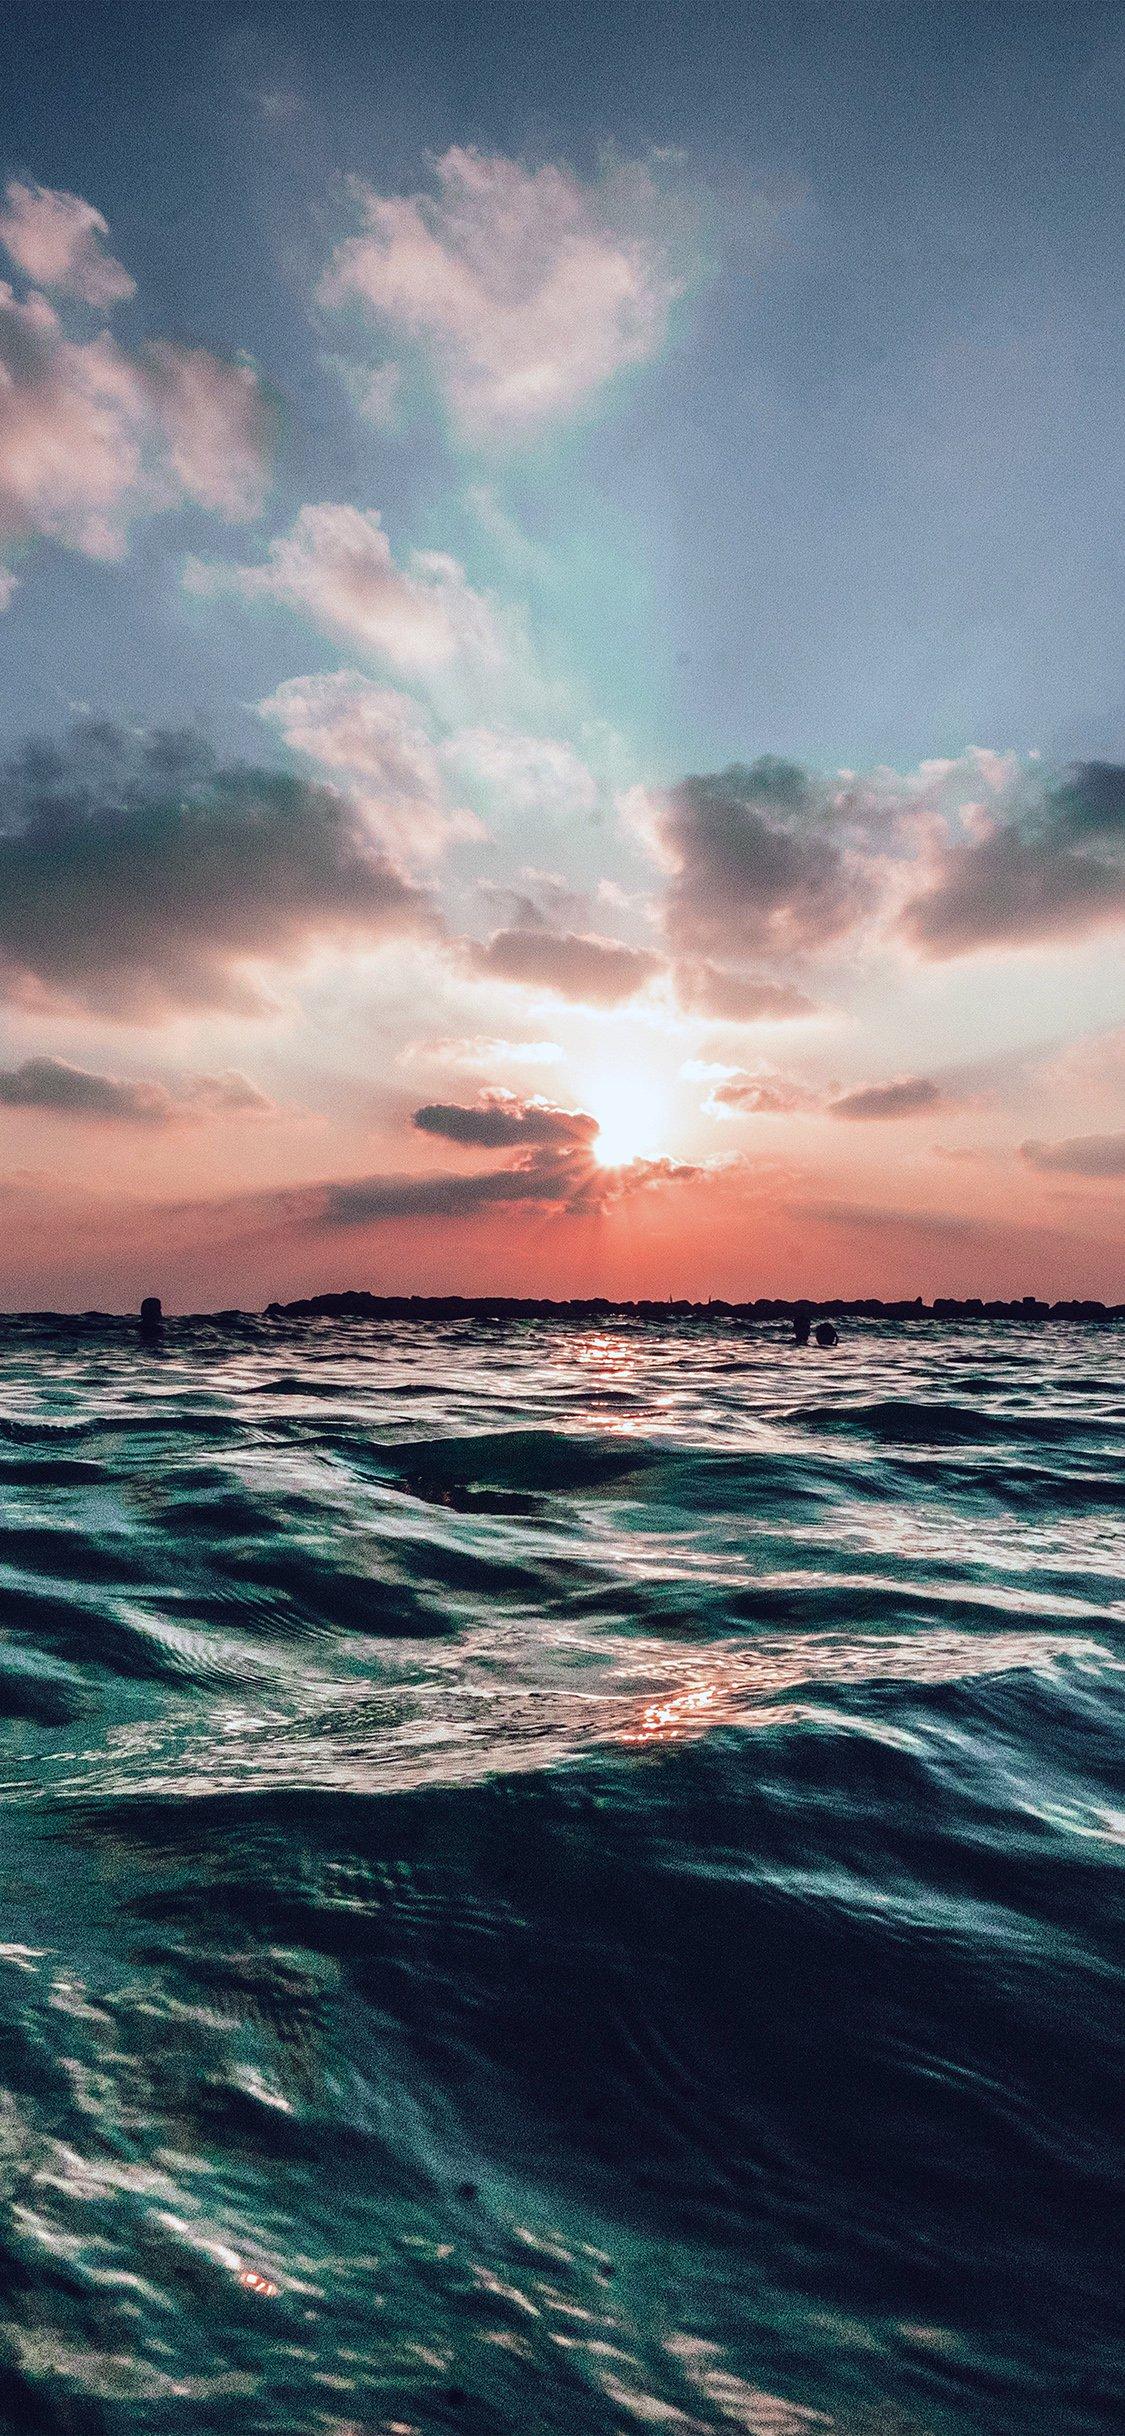 Sunset sea sky iPhone X wallpaper